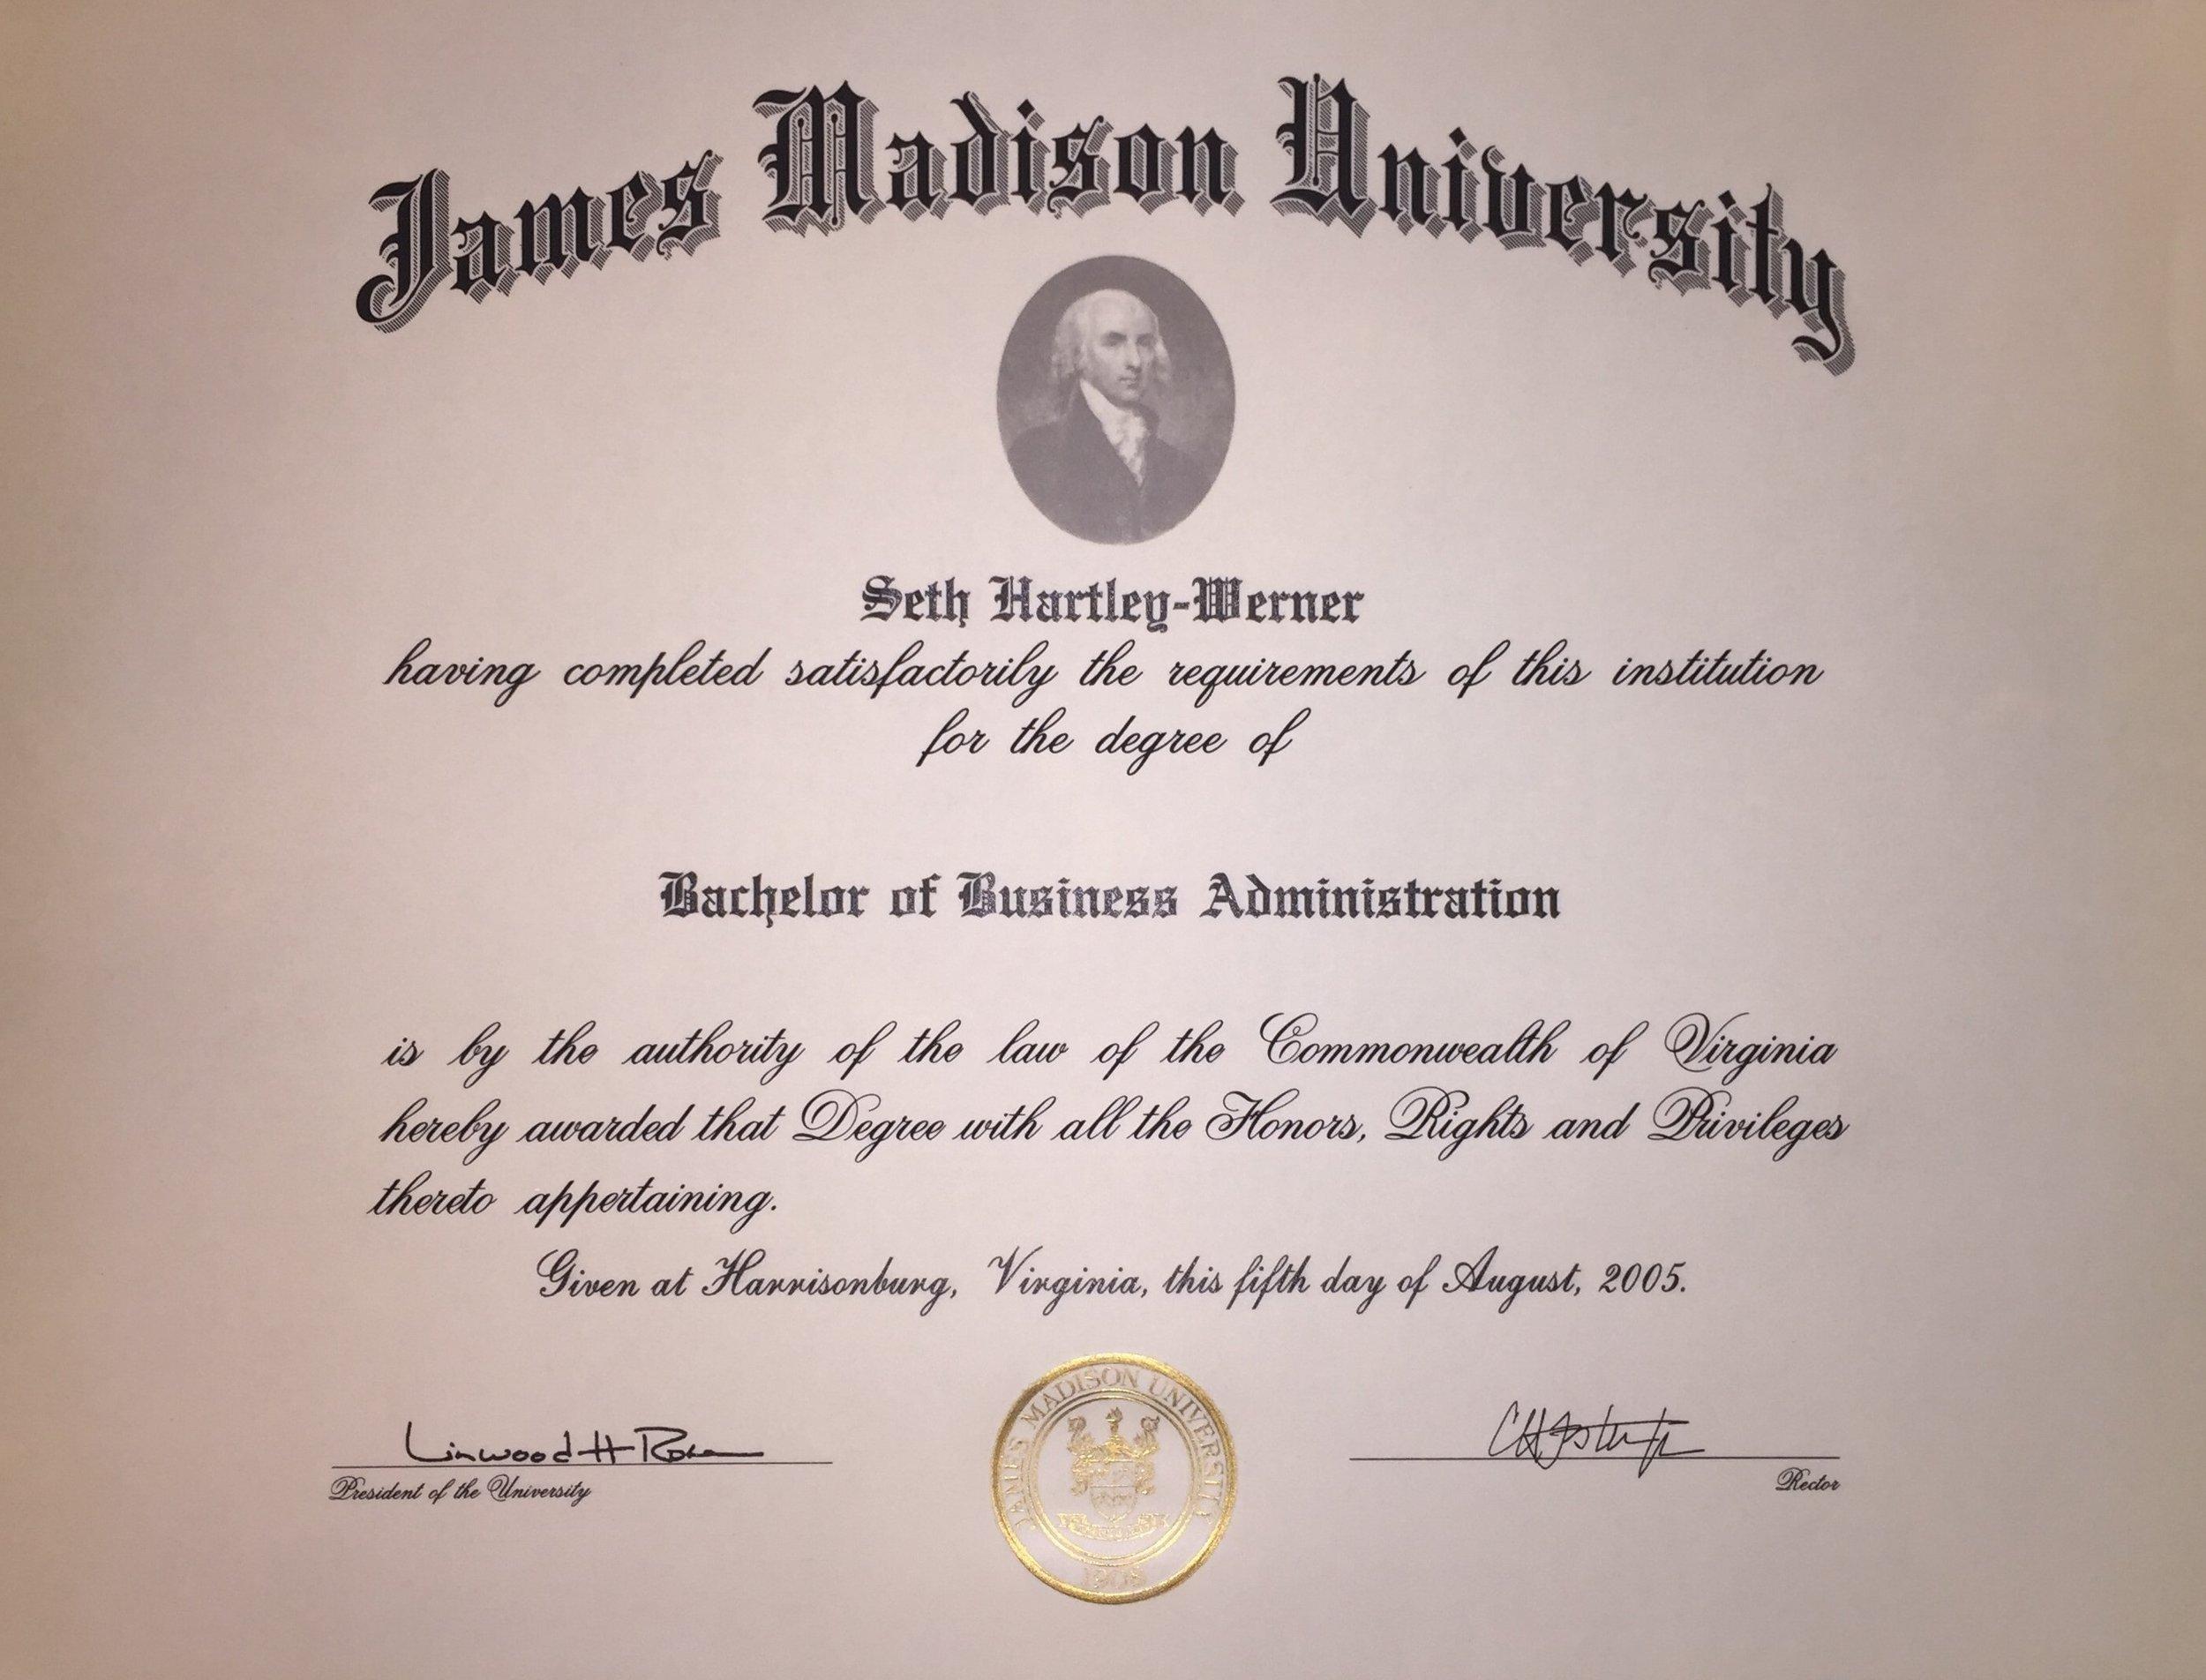 Bachelor of Business Administration - James Madison UniversityHarrisonburg, Virginia2005